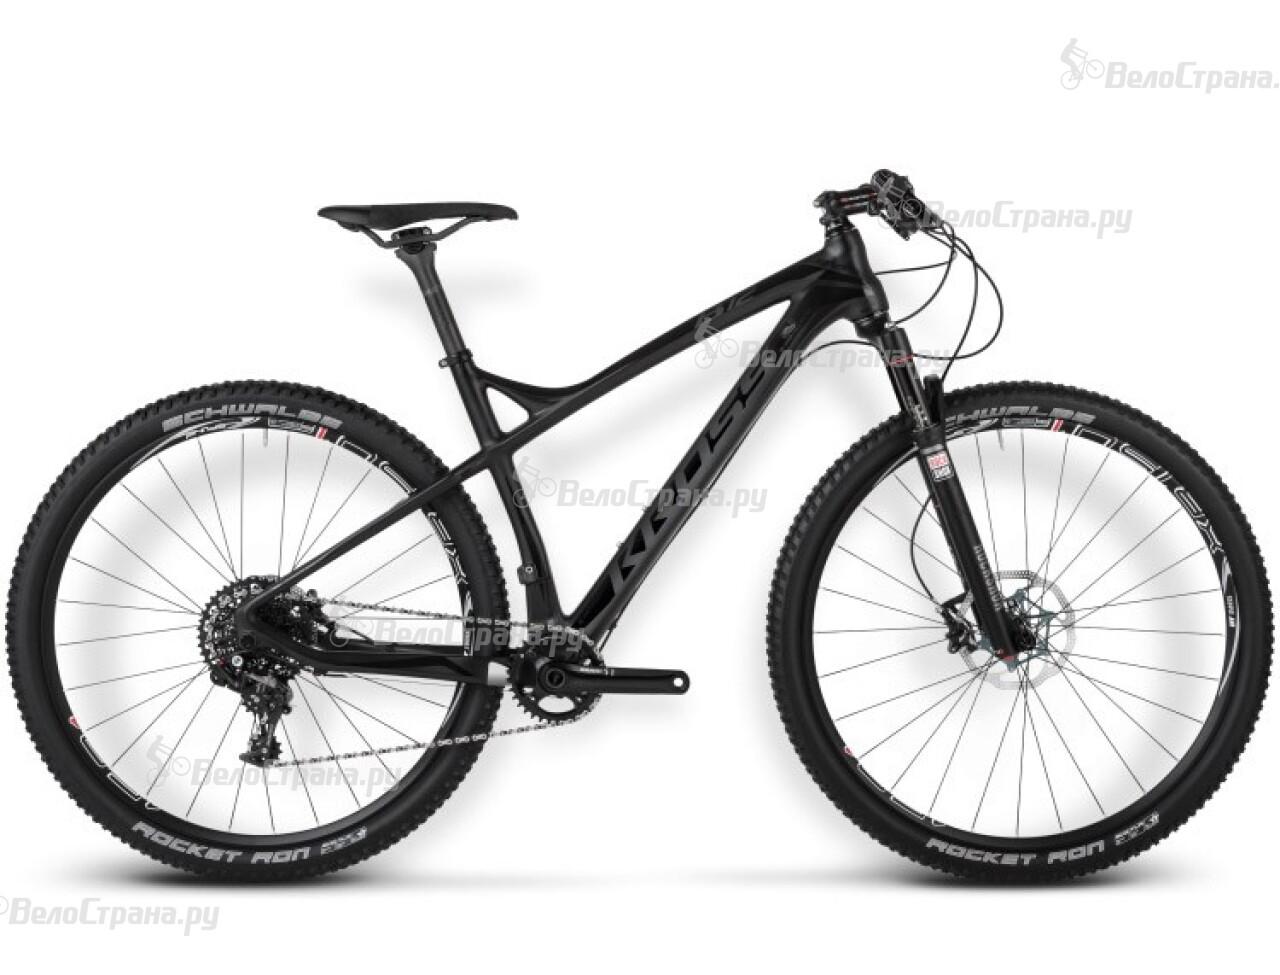 купить Велосипед Kross Level B12 (2015) недорого